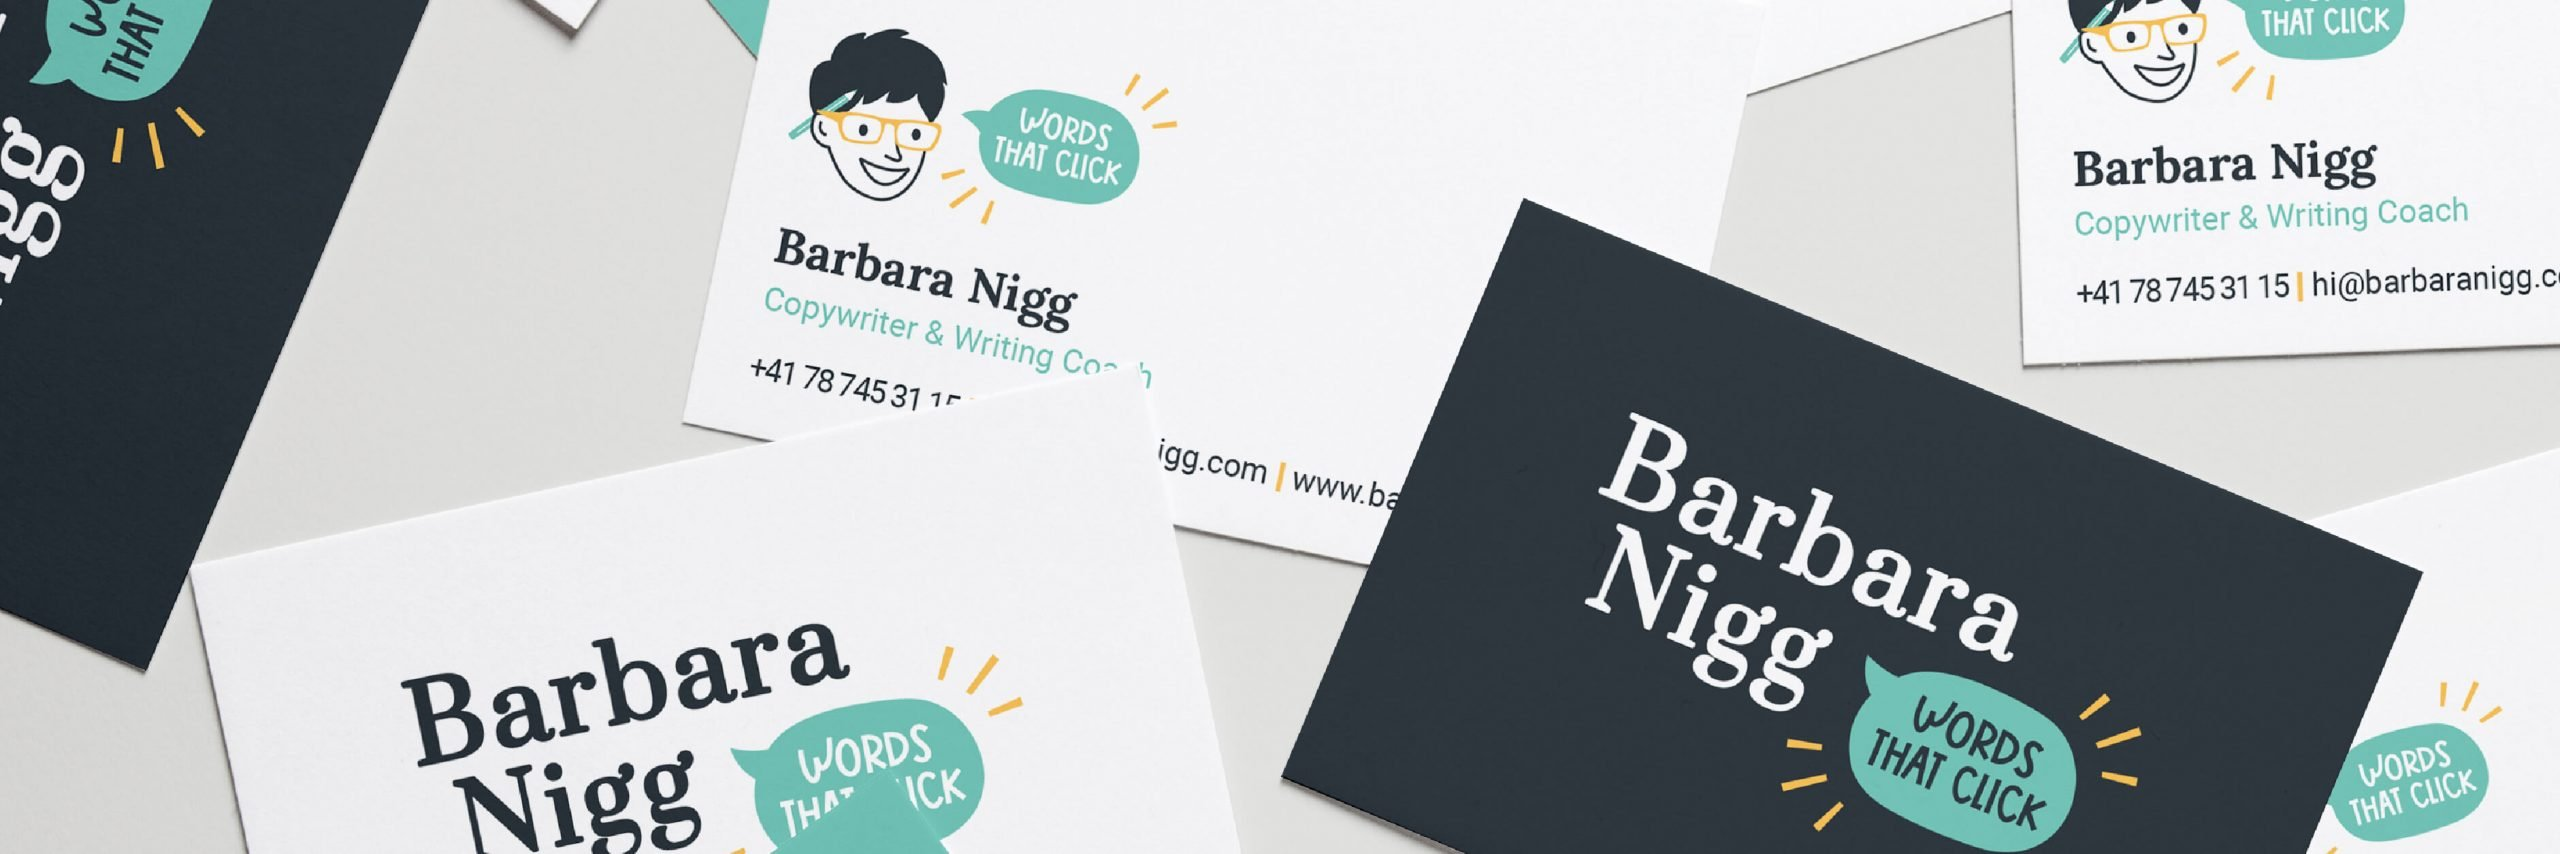 Business Card Design for the Barbara Nigg Brand